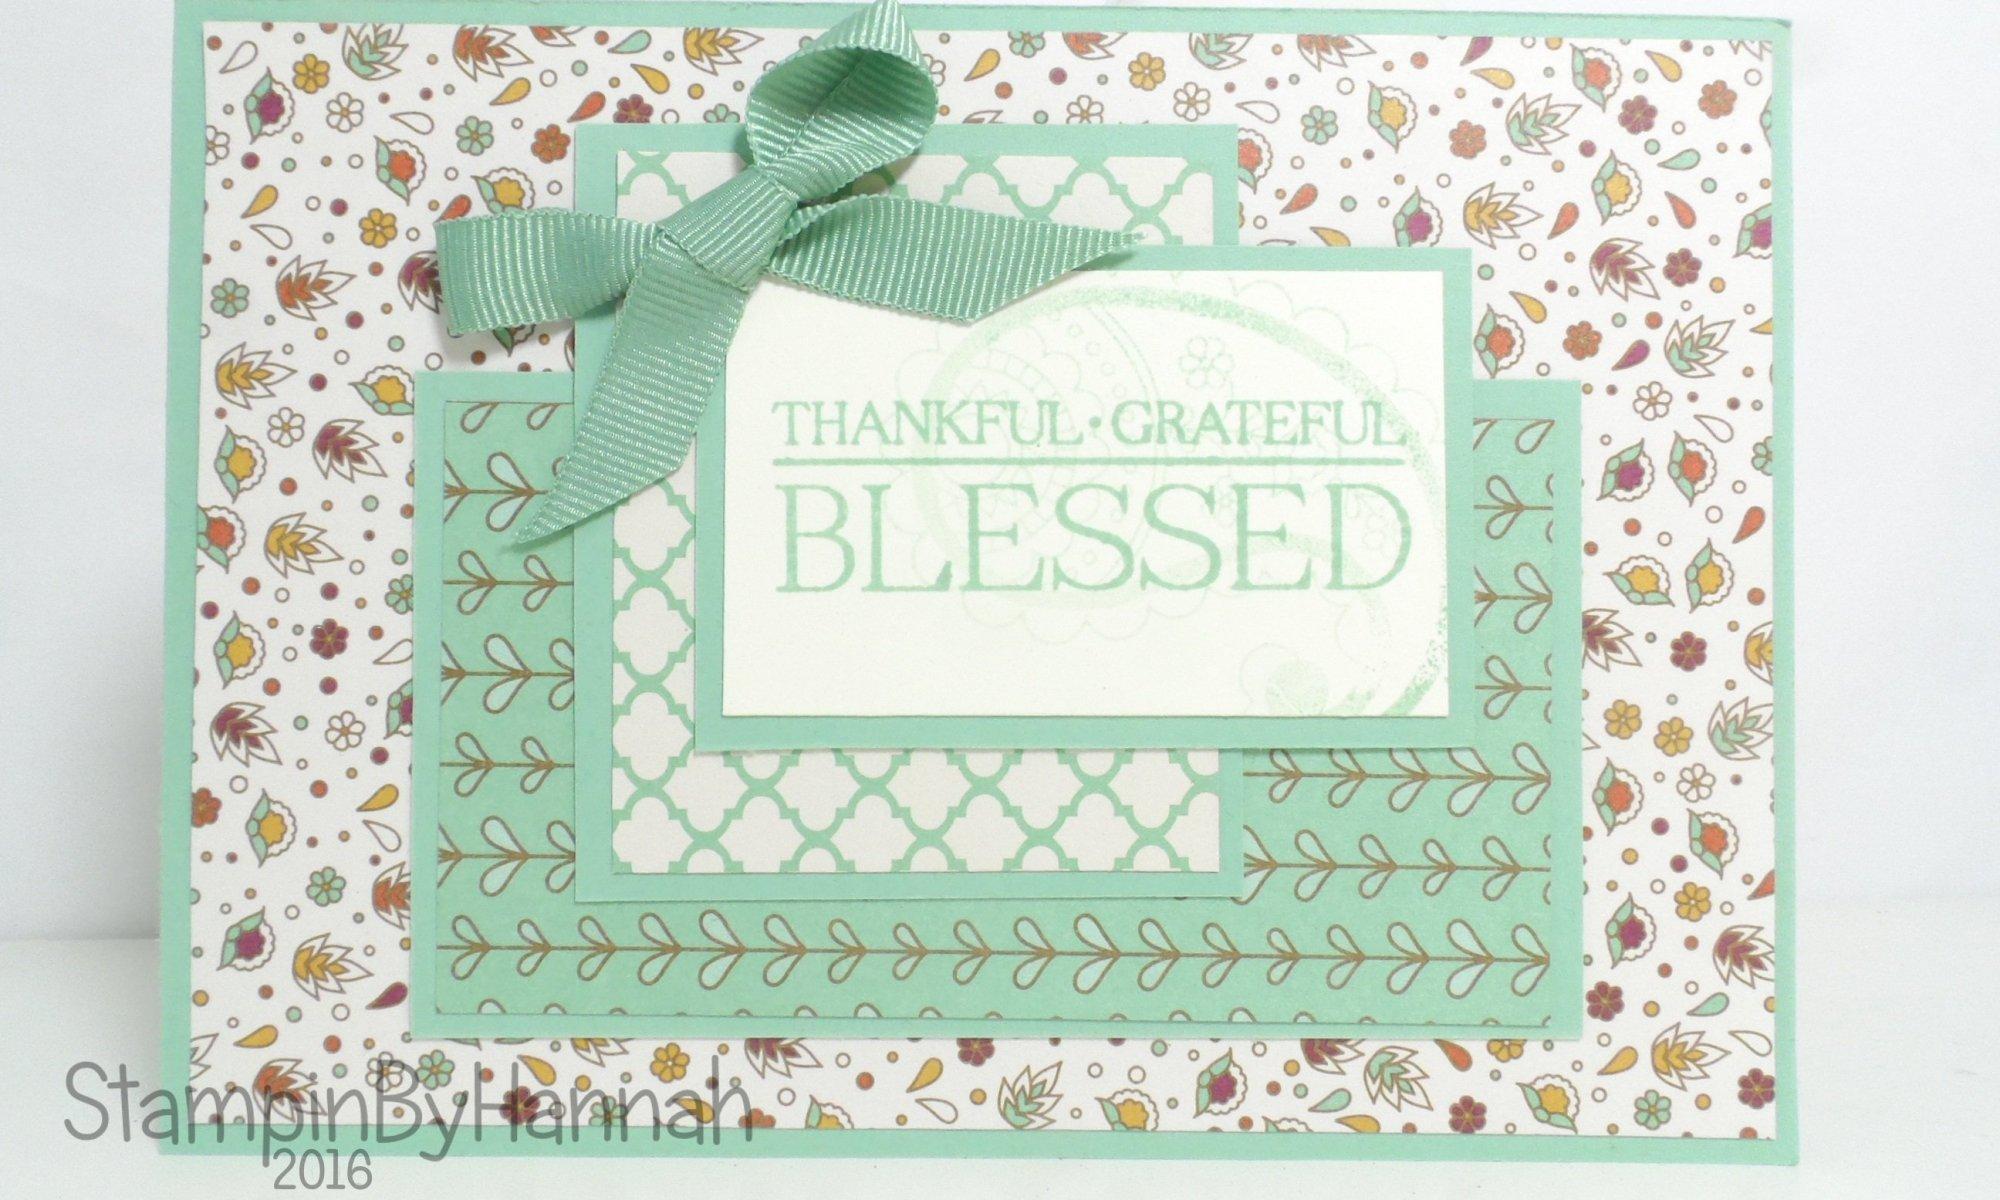 Petals and Paisleys Designer Series Paper Card using Stampin' up! UK